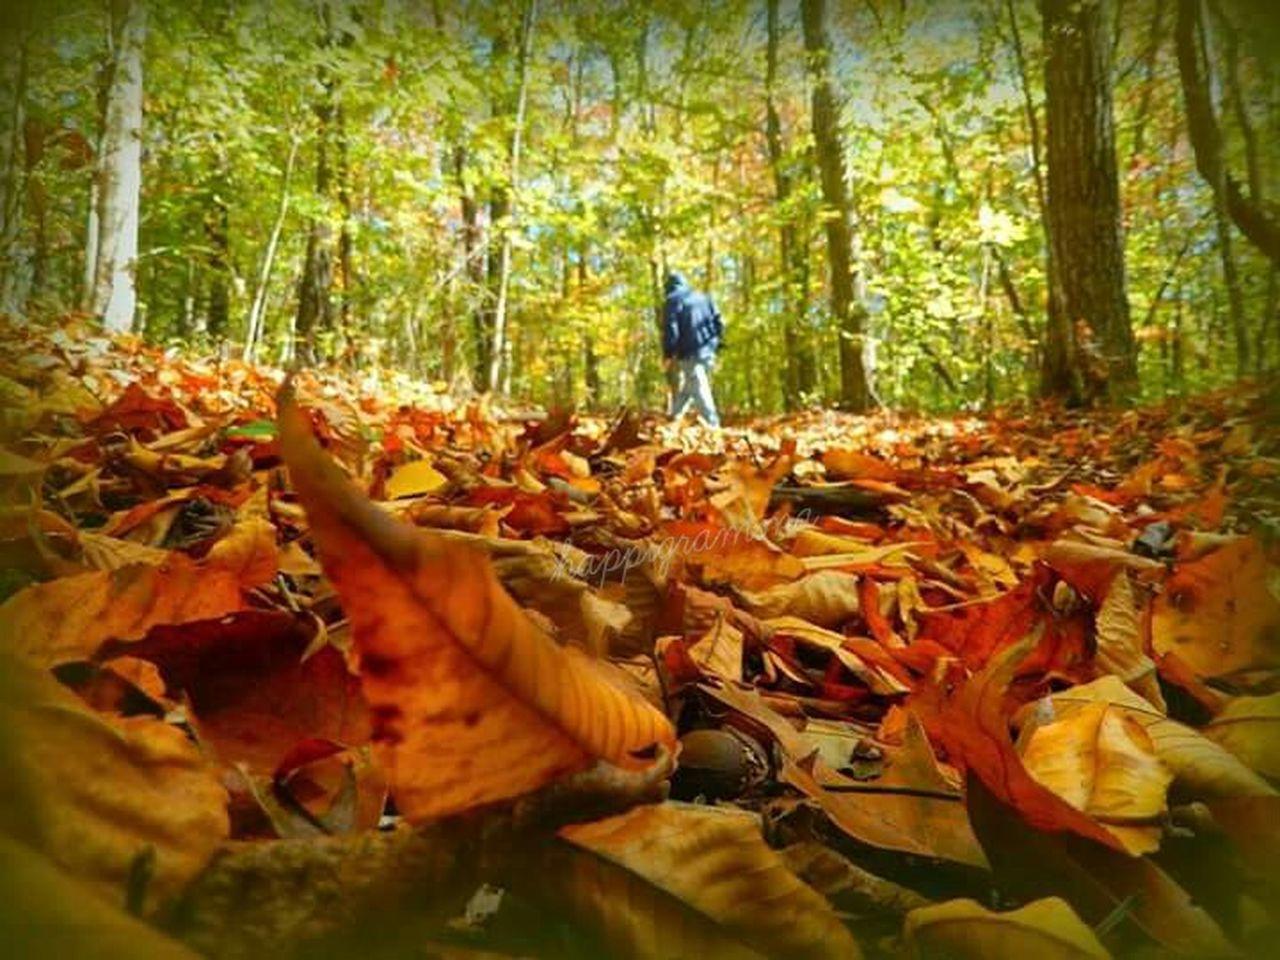 Inthewoids Fall Colors Autumnwalk Happigramma Thesmallestlittlethings Godscountry Serenity EyeEmbestshots EyeEm Best Shots Nikon Photography Eyeemweekly